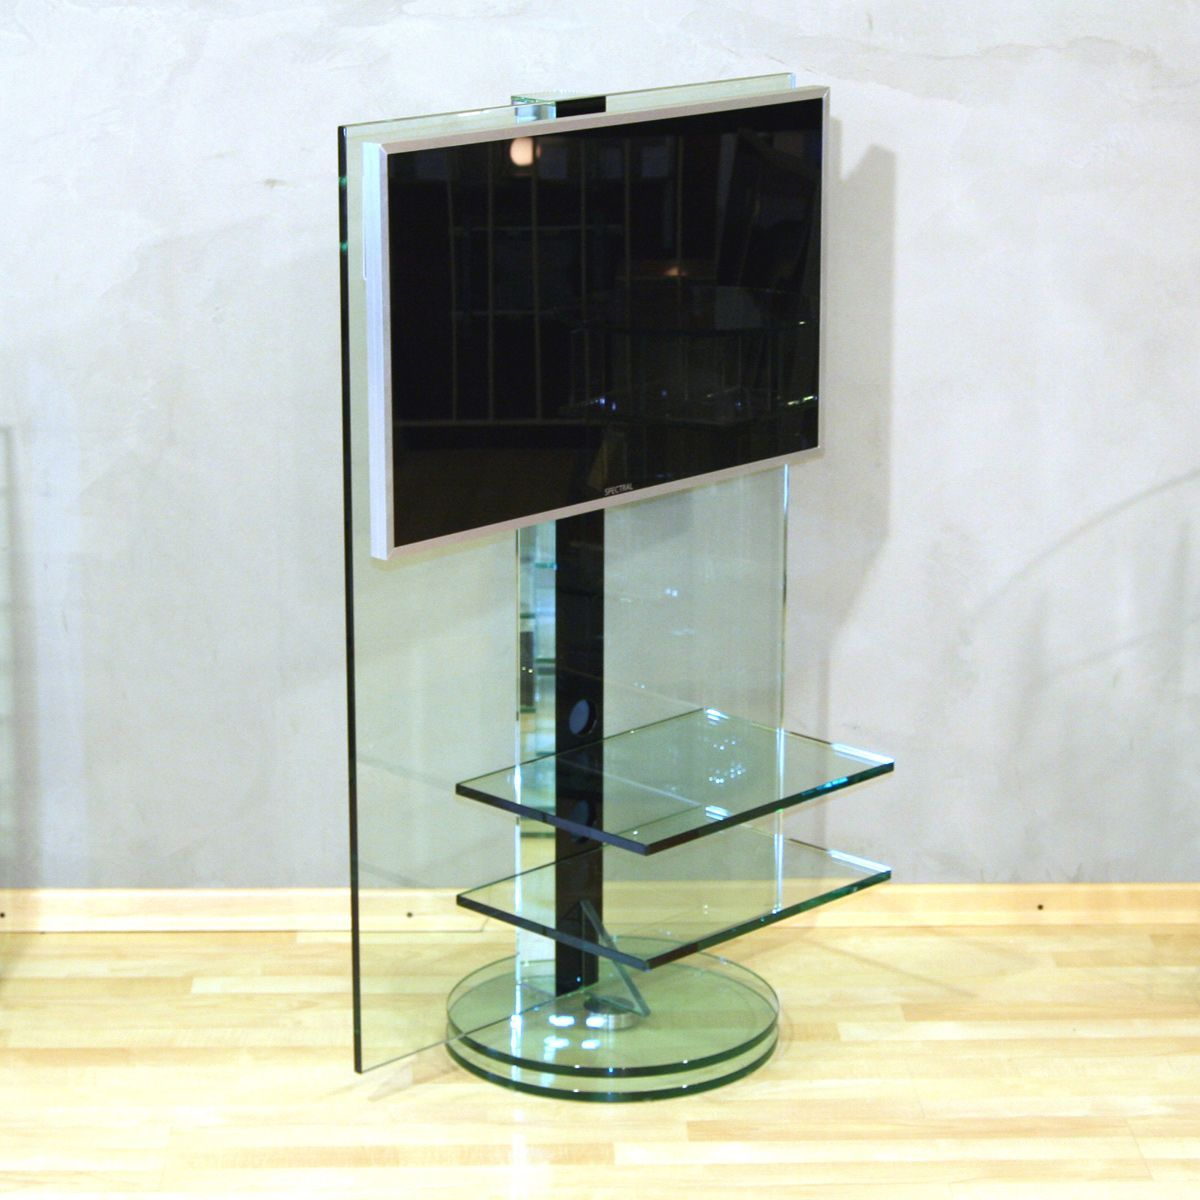 tv hifi möbel glas - hi-fi son - tv hifi möbel glas - in